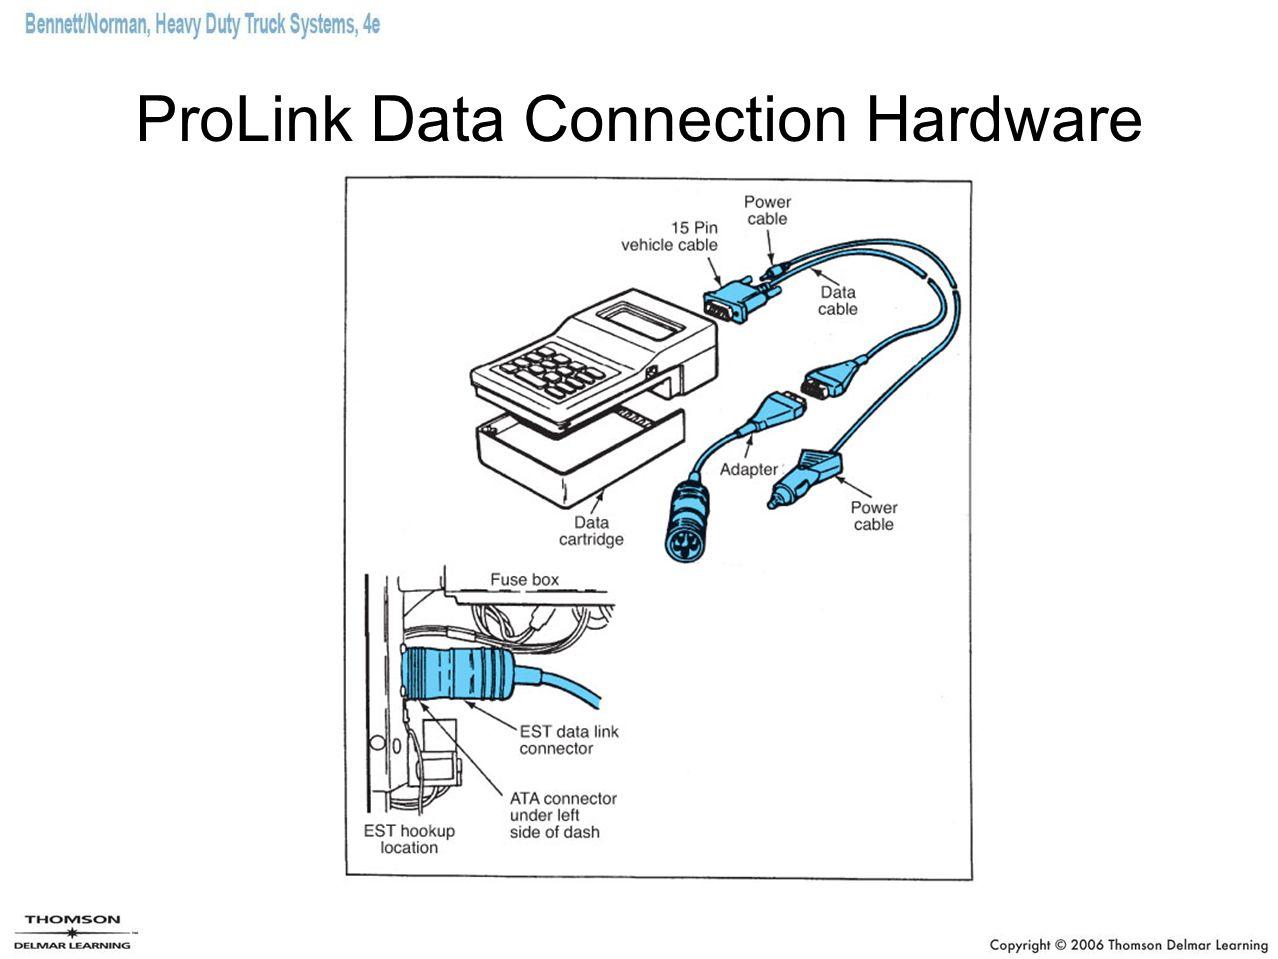 ProLink Data Connection Hardware